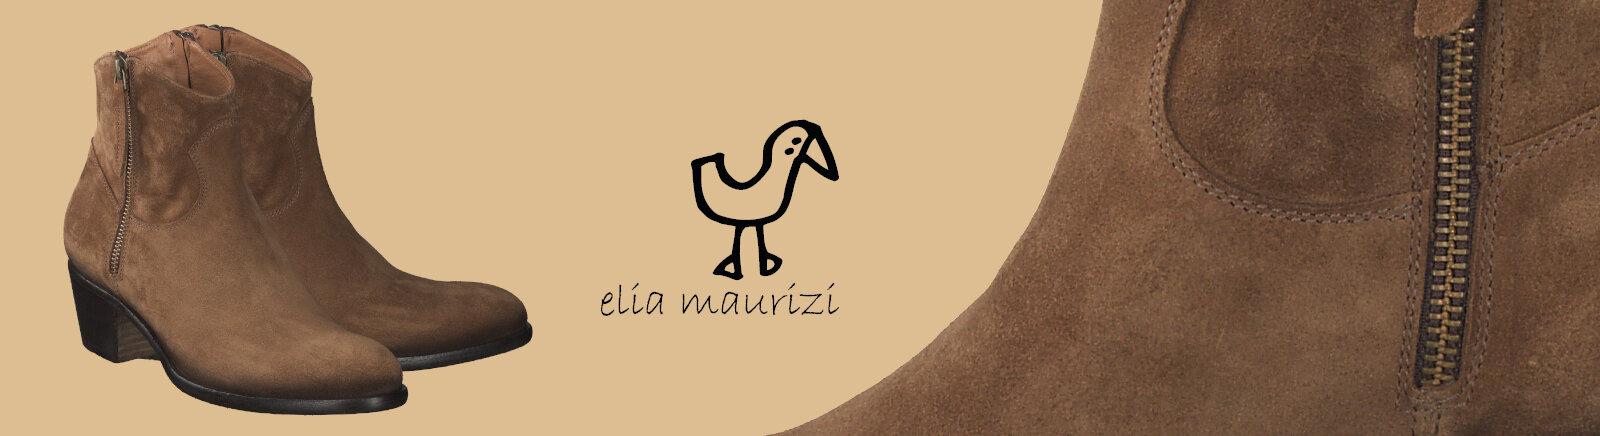 Juppen: Elia Maurizi Boots für Herren online shoppen